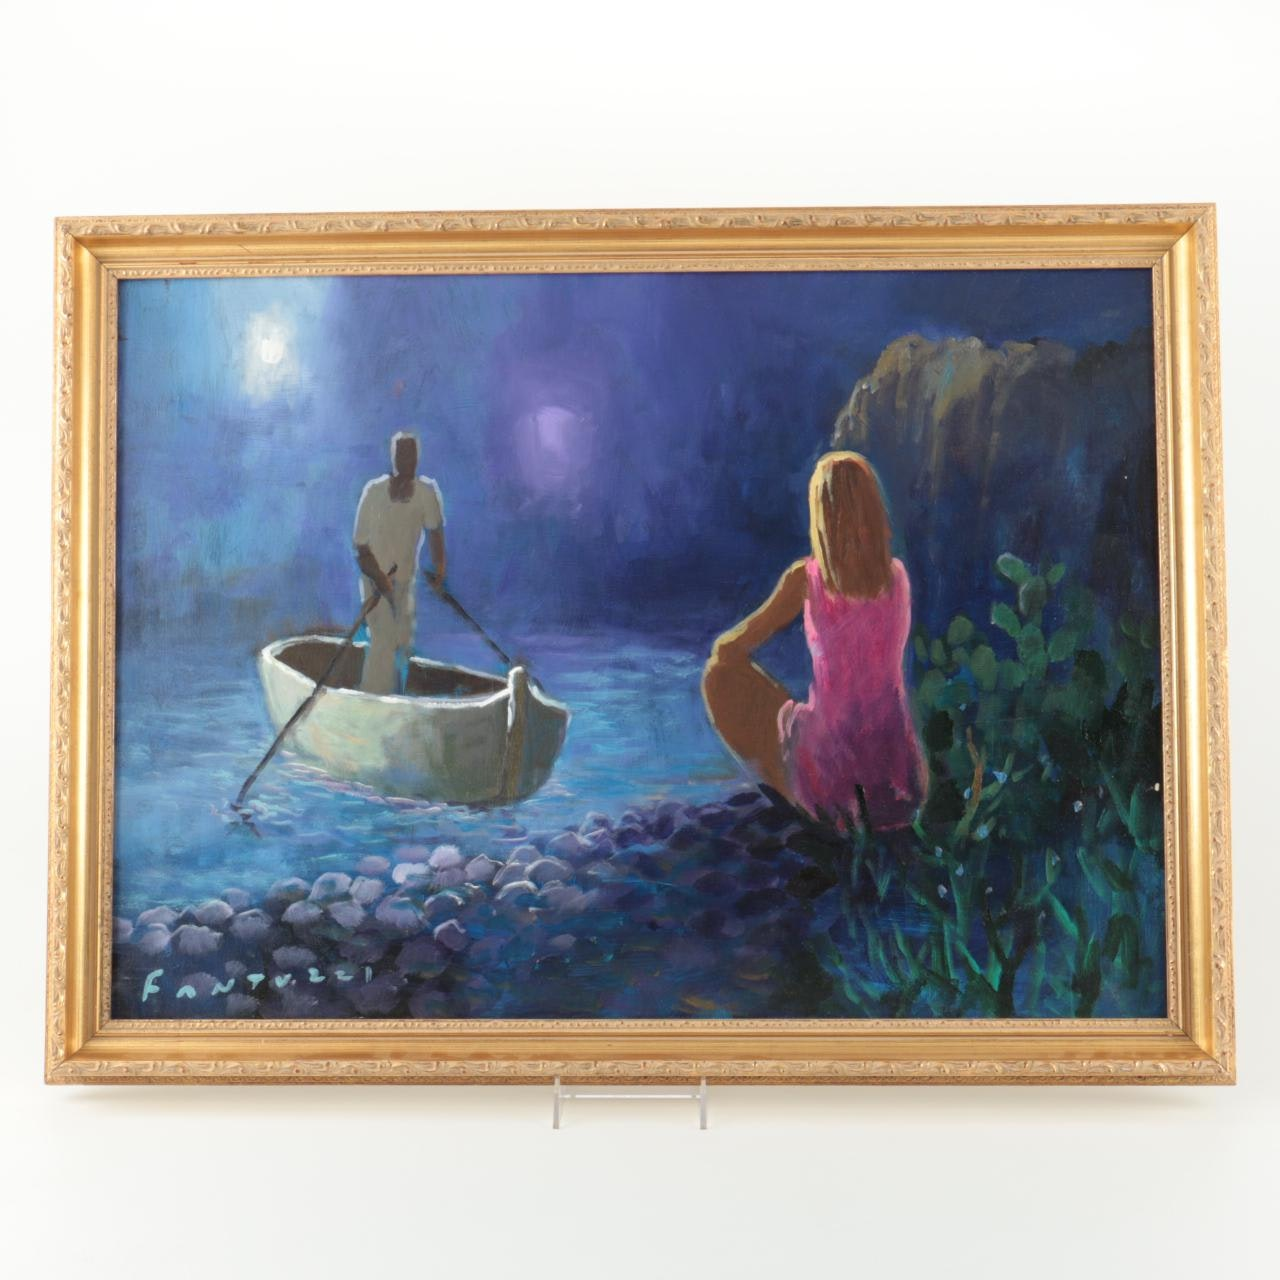 Eliano Fantuzzi Original Oil Painting on Canvas